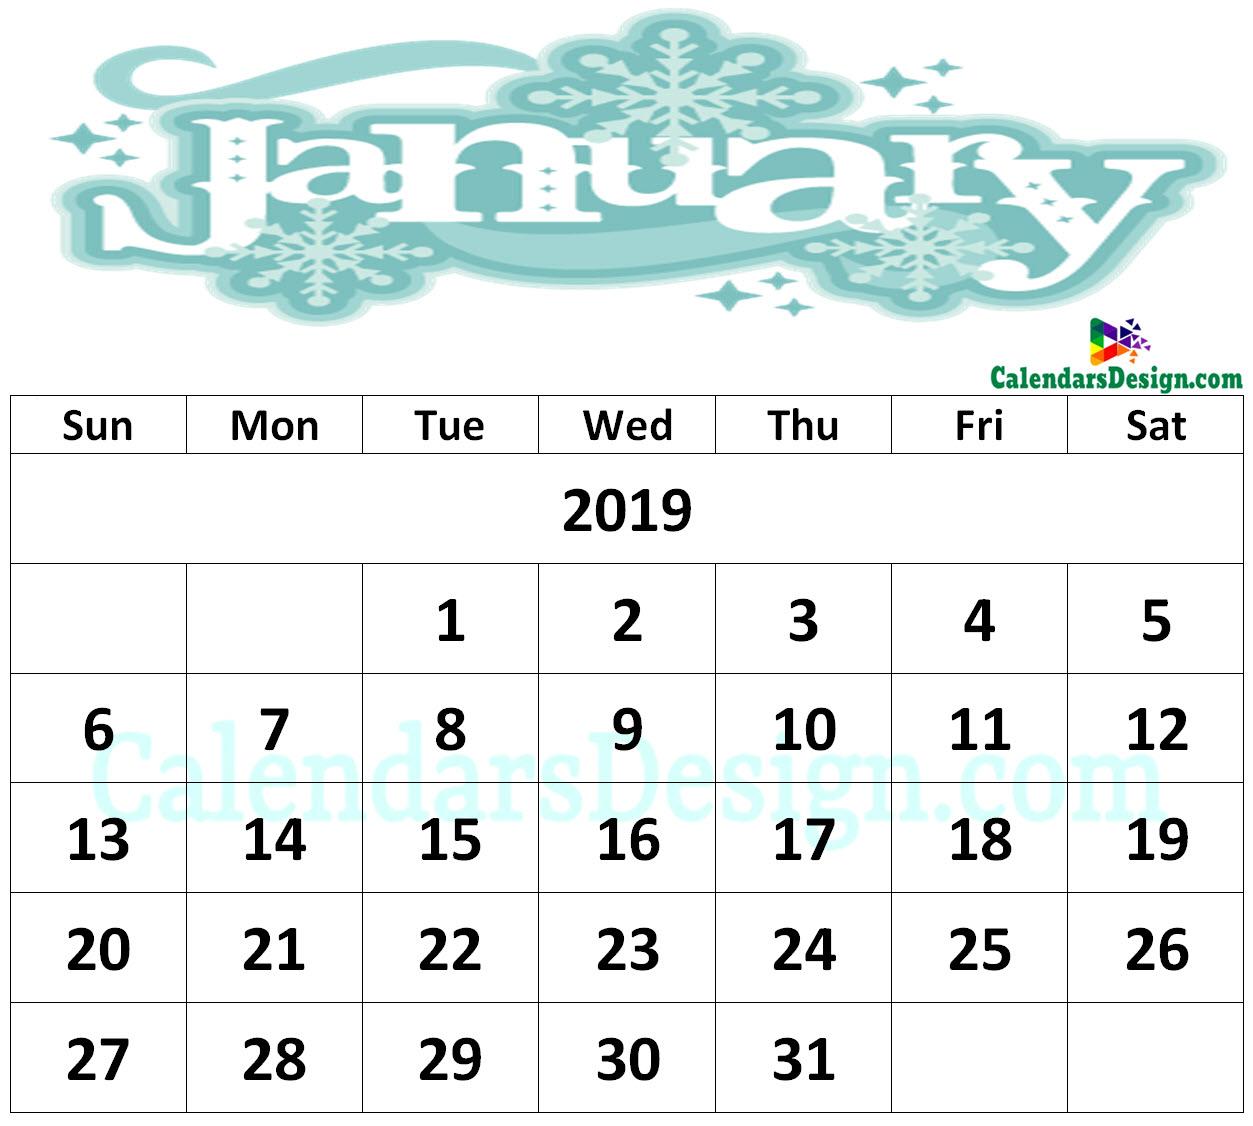 Floral January 2019 Wall Calendar